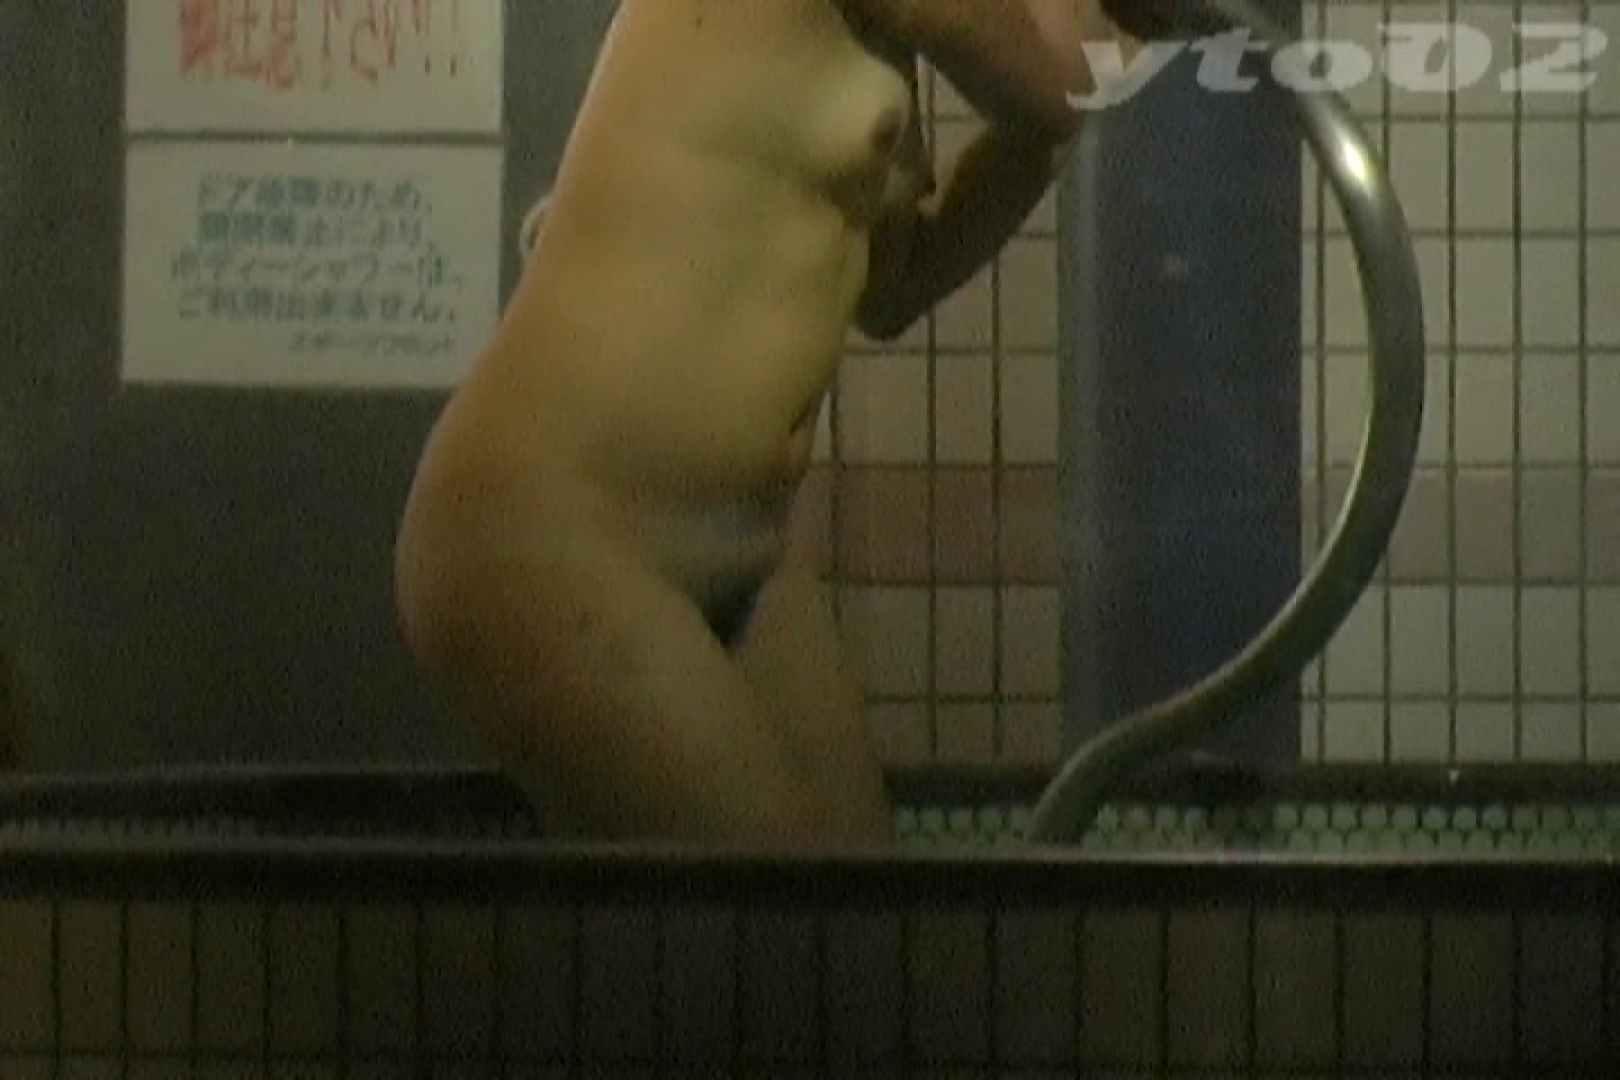 ▲復活限定▲合宿ホテル女風呂盗撮 Vol.11 入浴  79pic 52